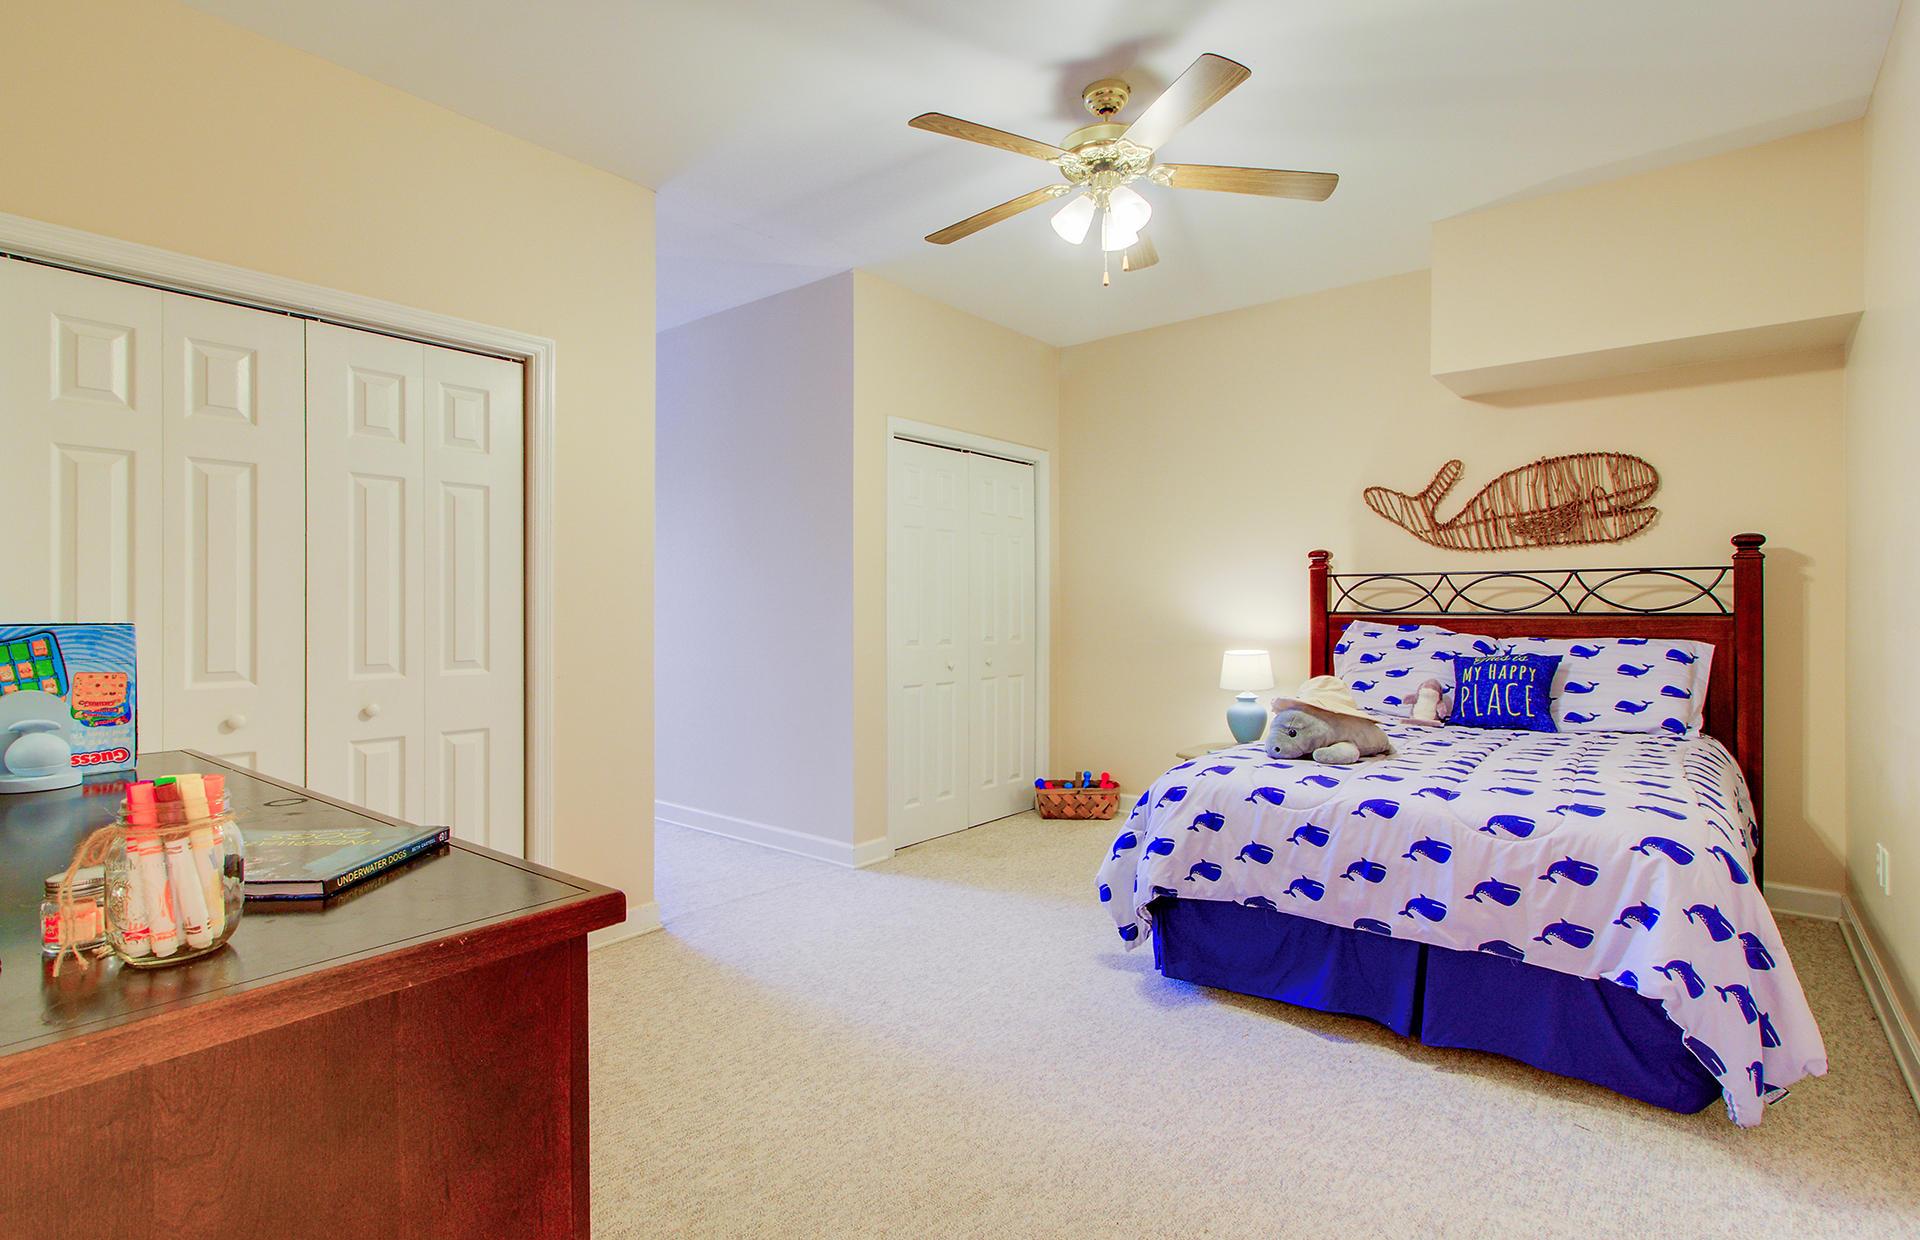 Bakers Landing Homes For Sale - 105 River Oak, North Charleston, SC - 8